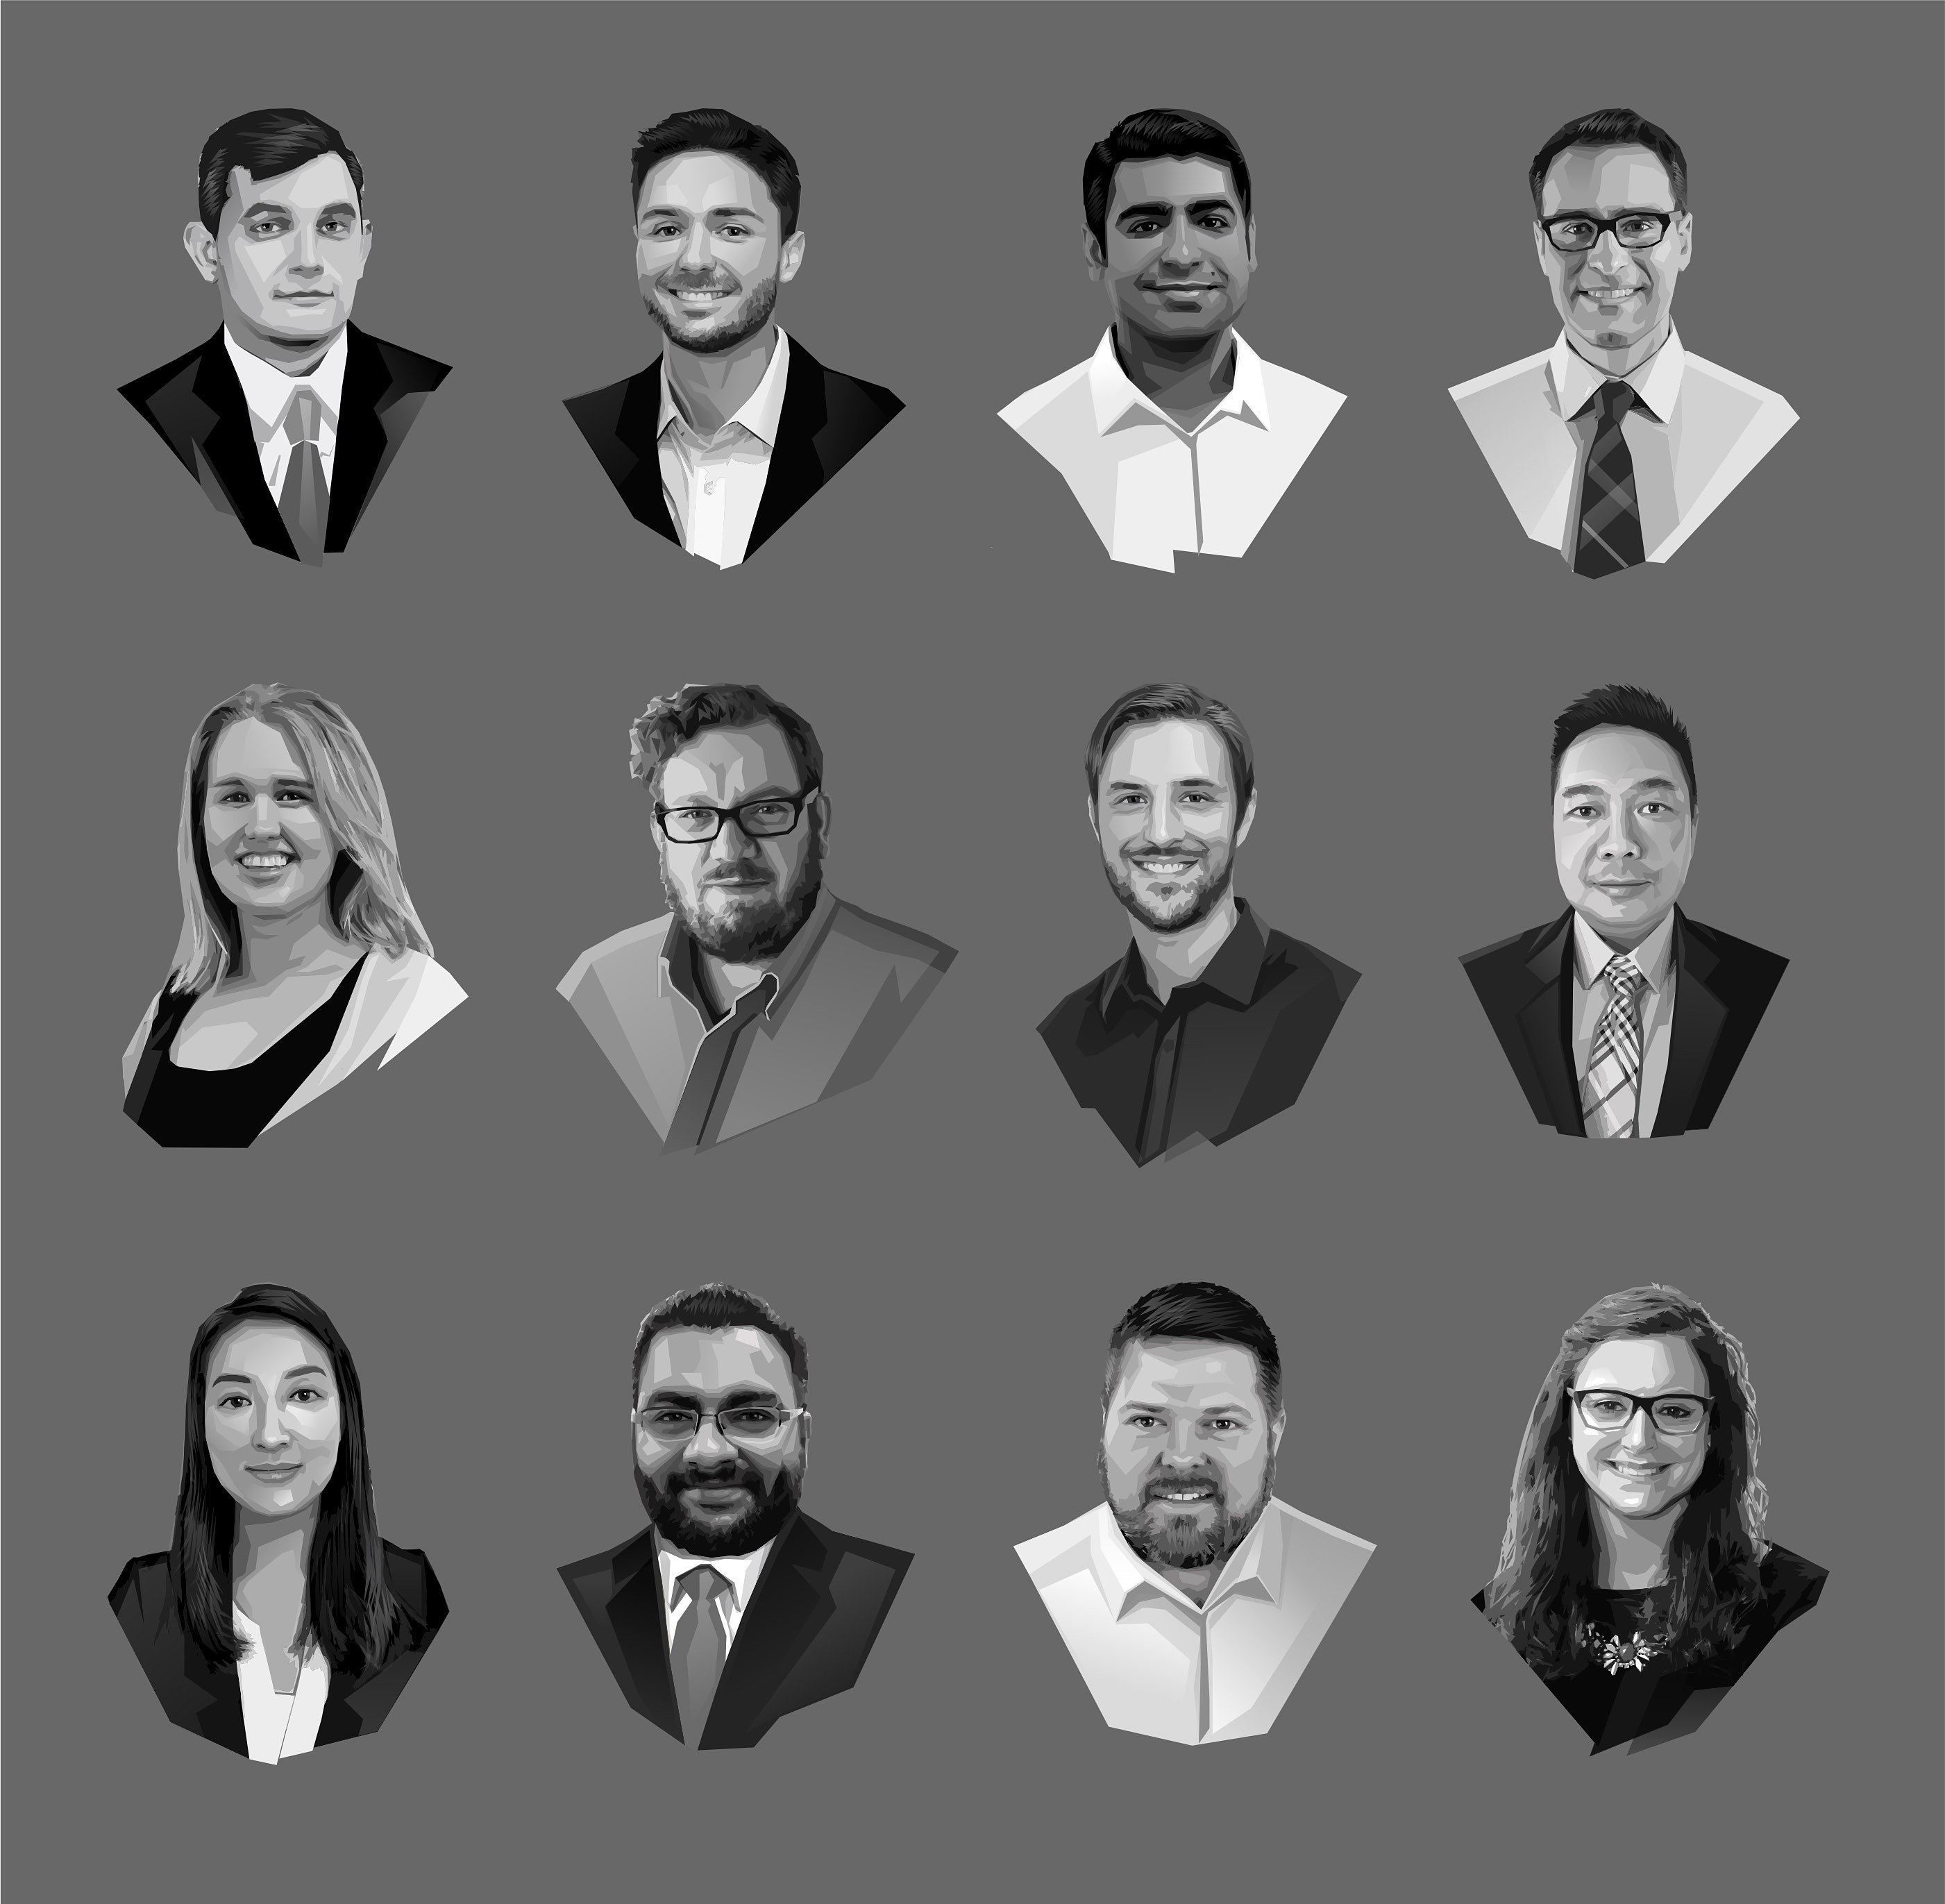 Internal Innovators - 11 people designs